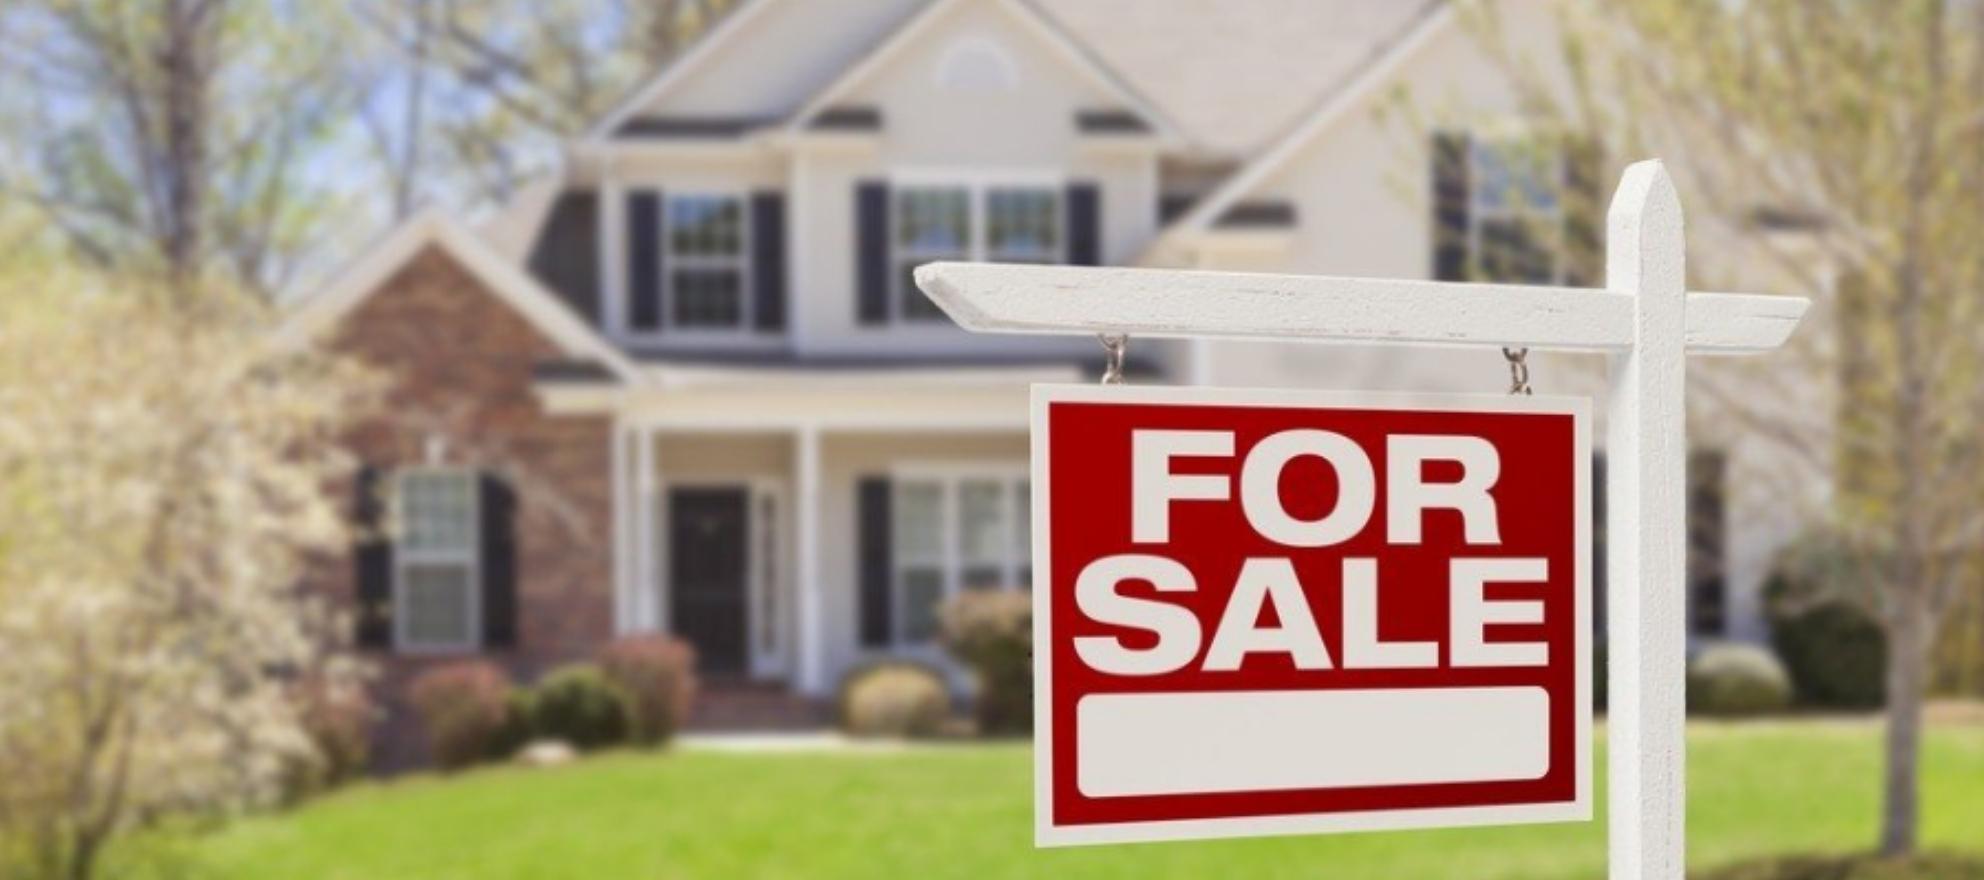 Despite softening home price growth, it's still a seller's market